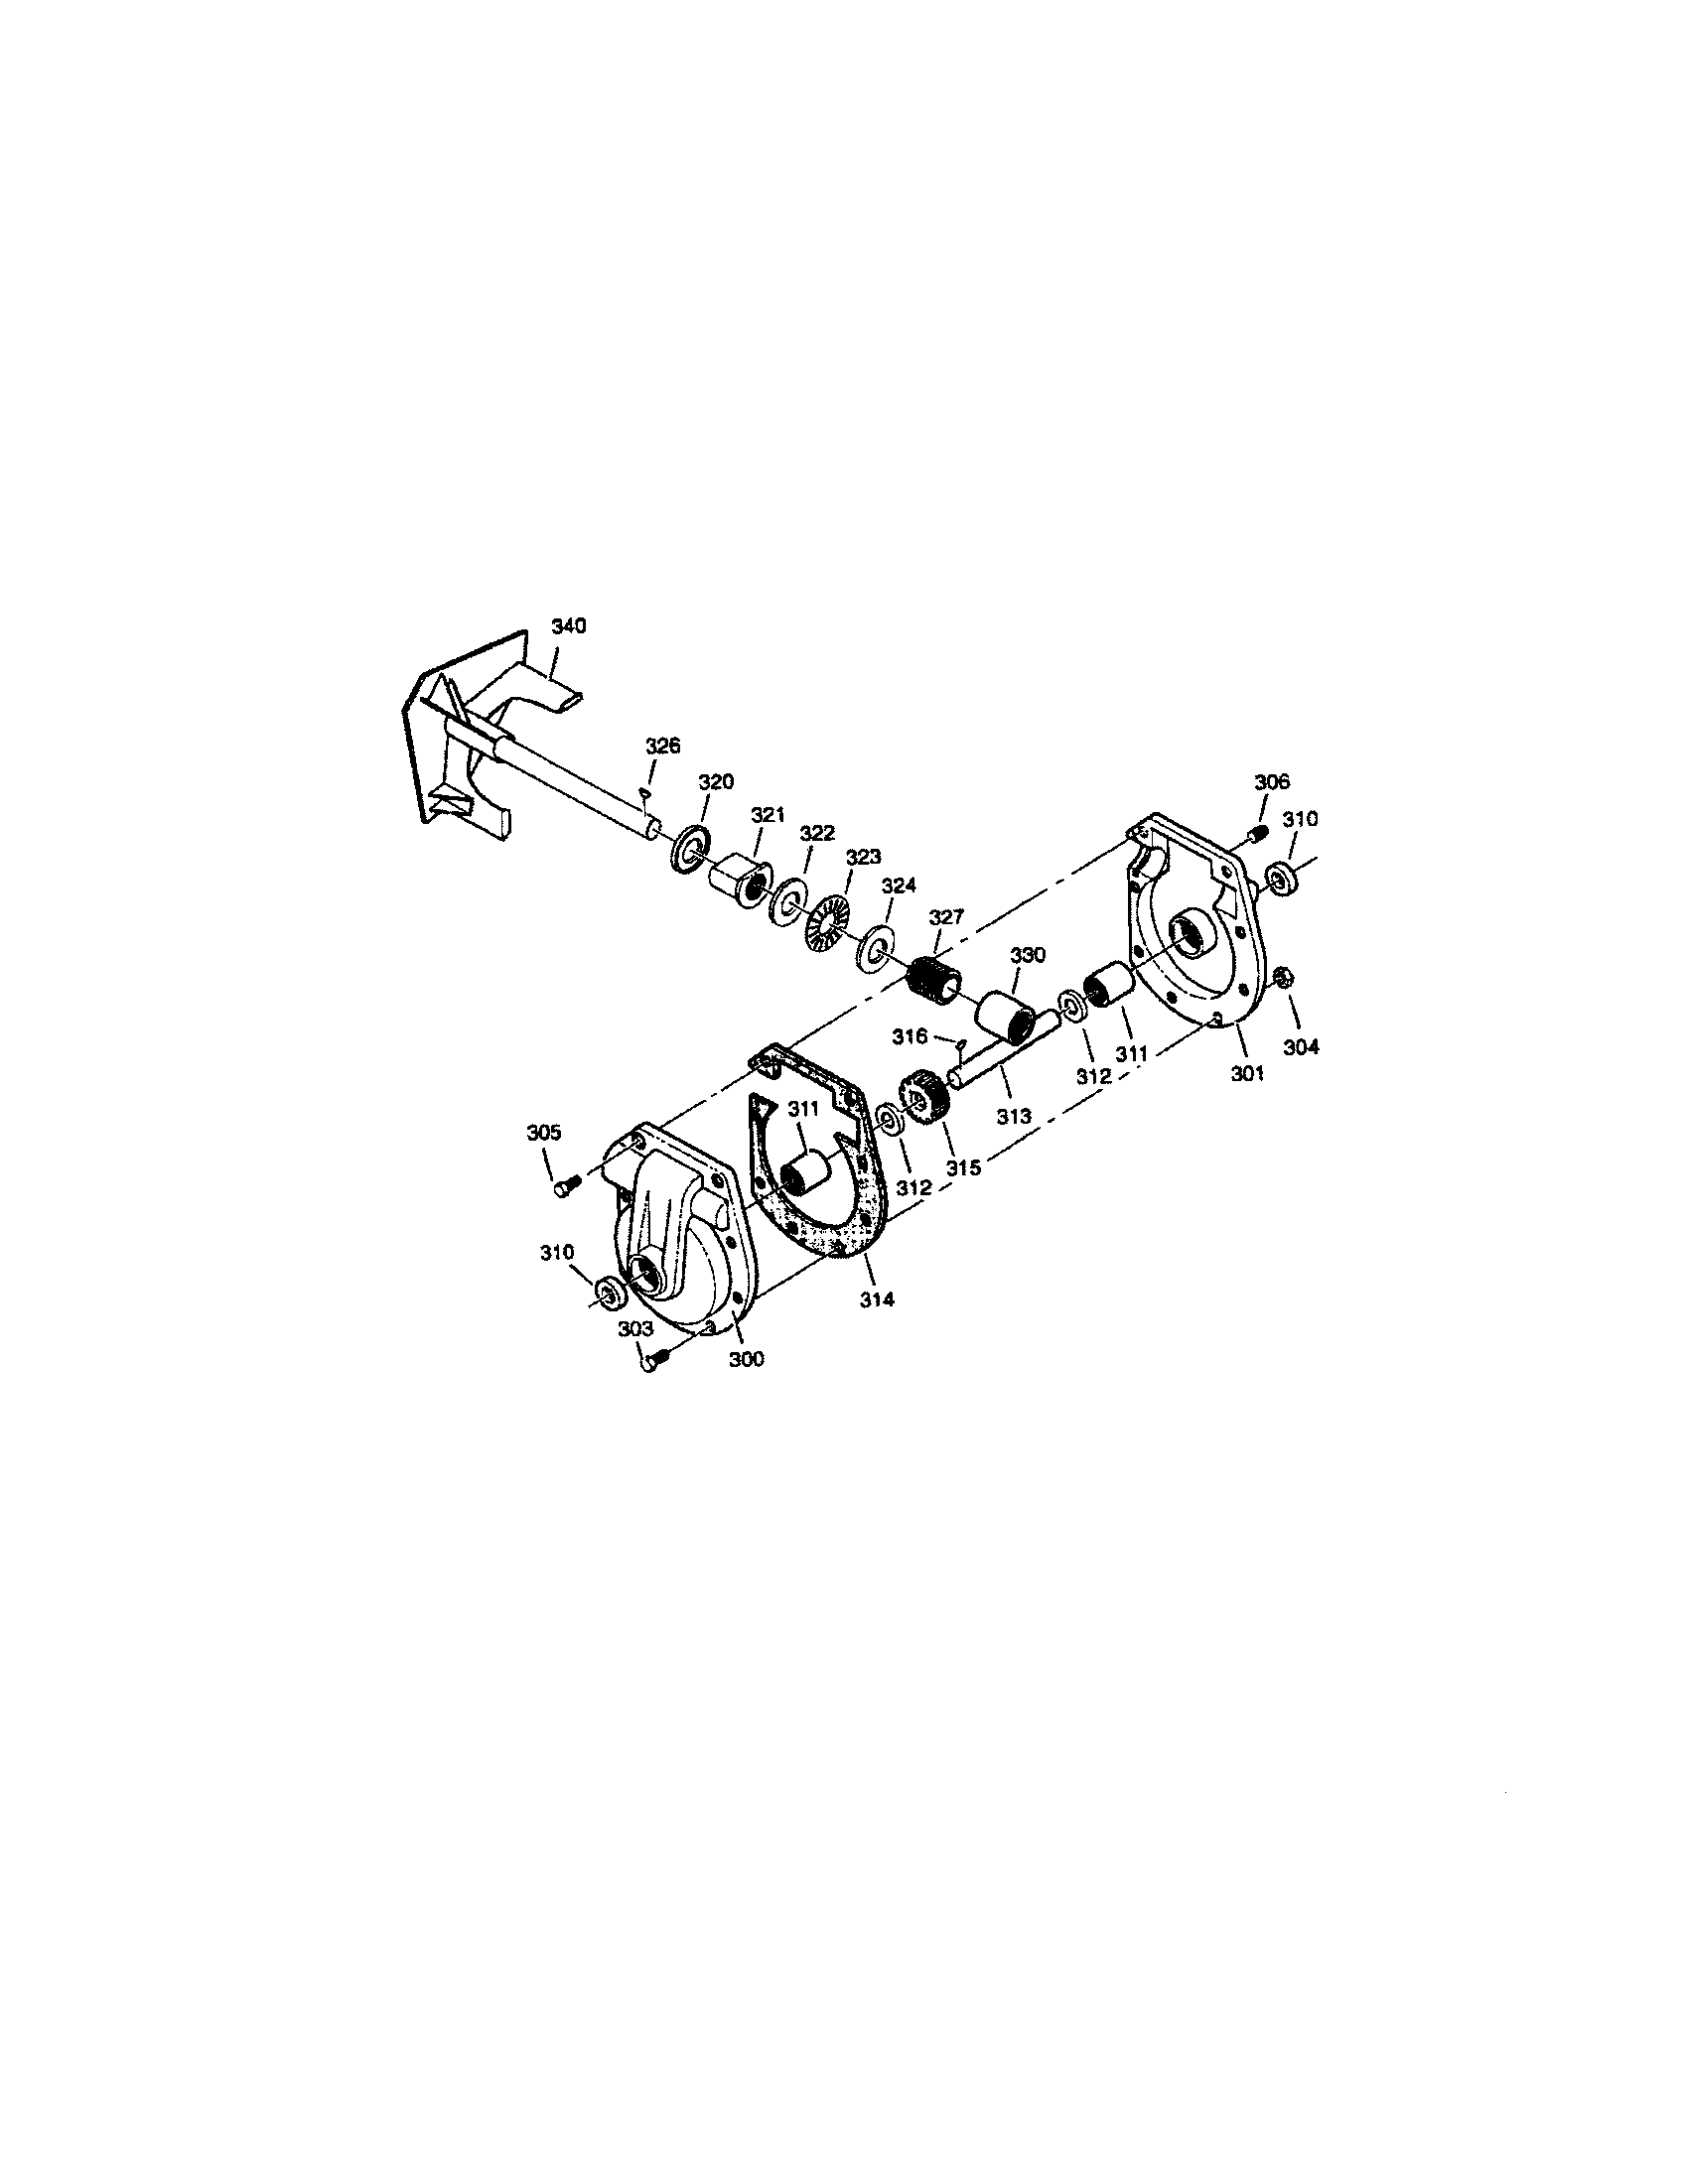 Sears-Canada model 95052311-0 snowthrower, gas genuine parts